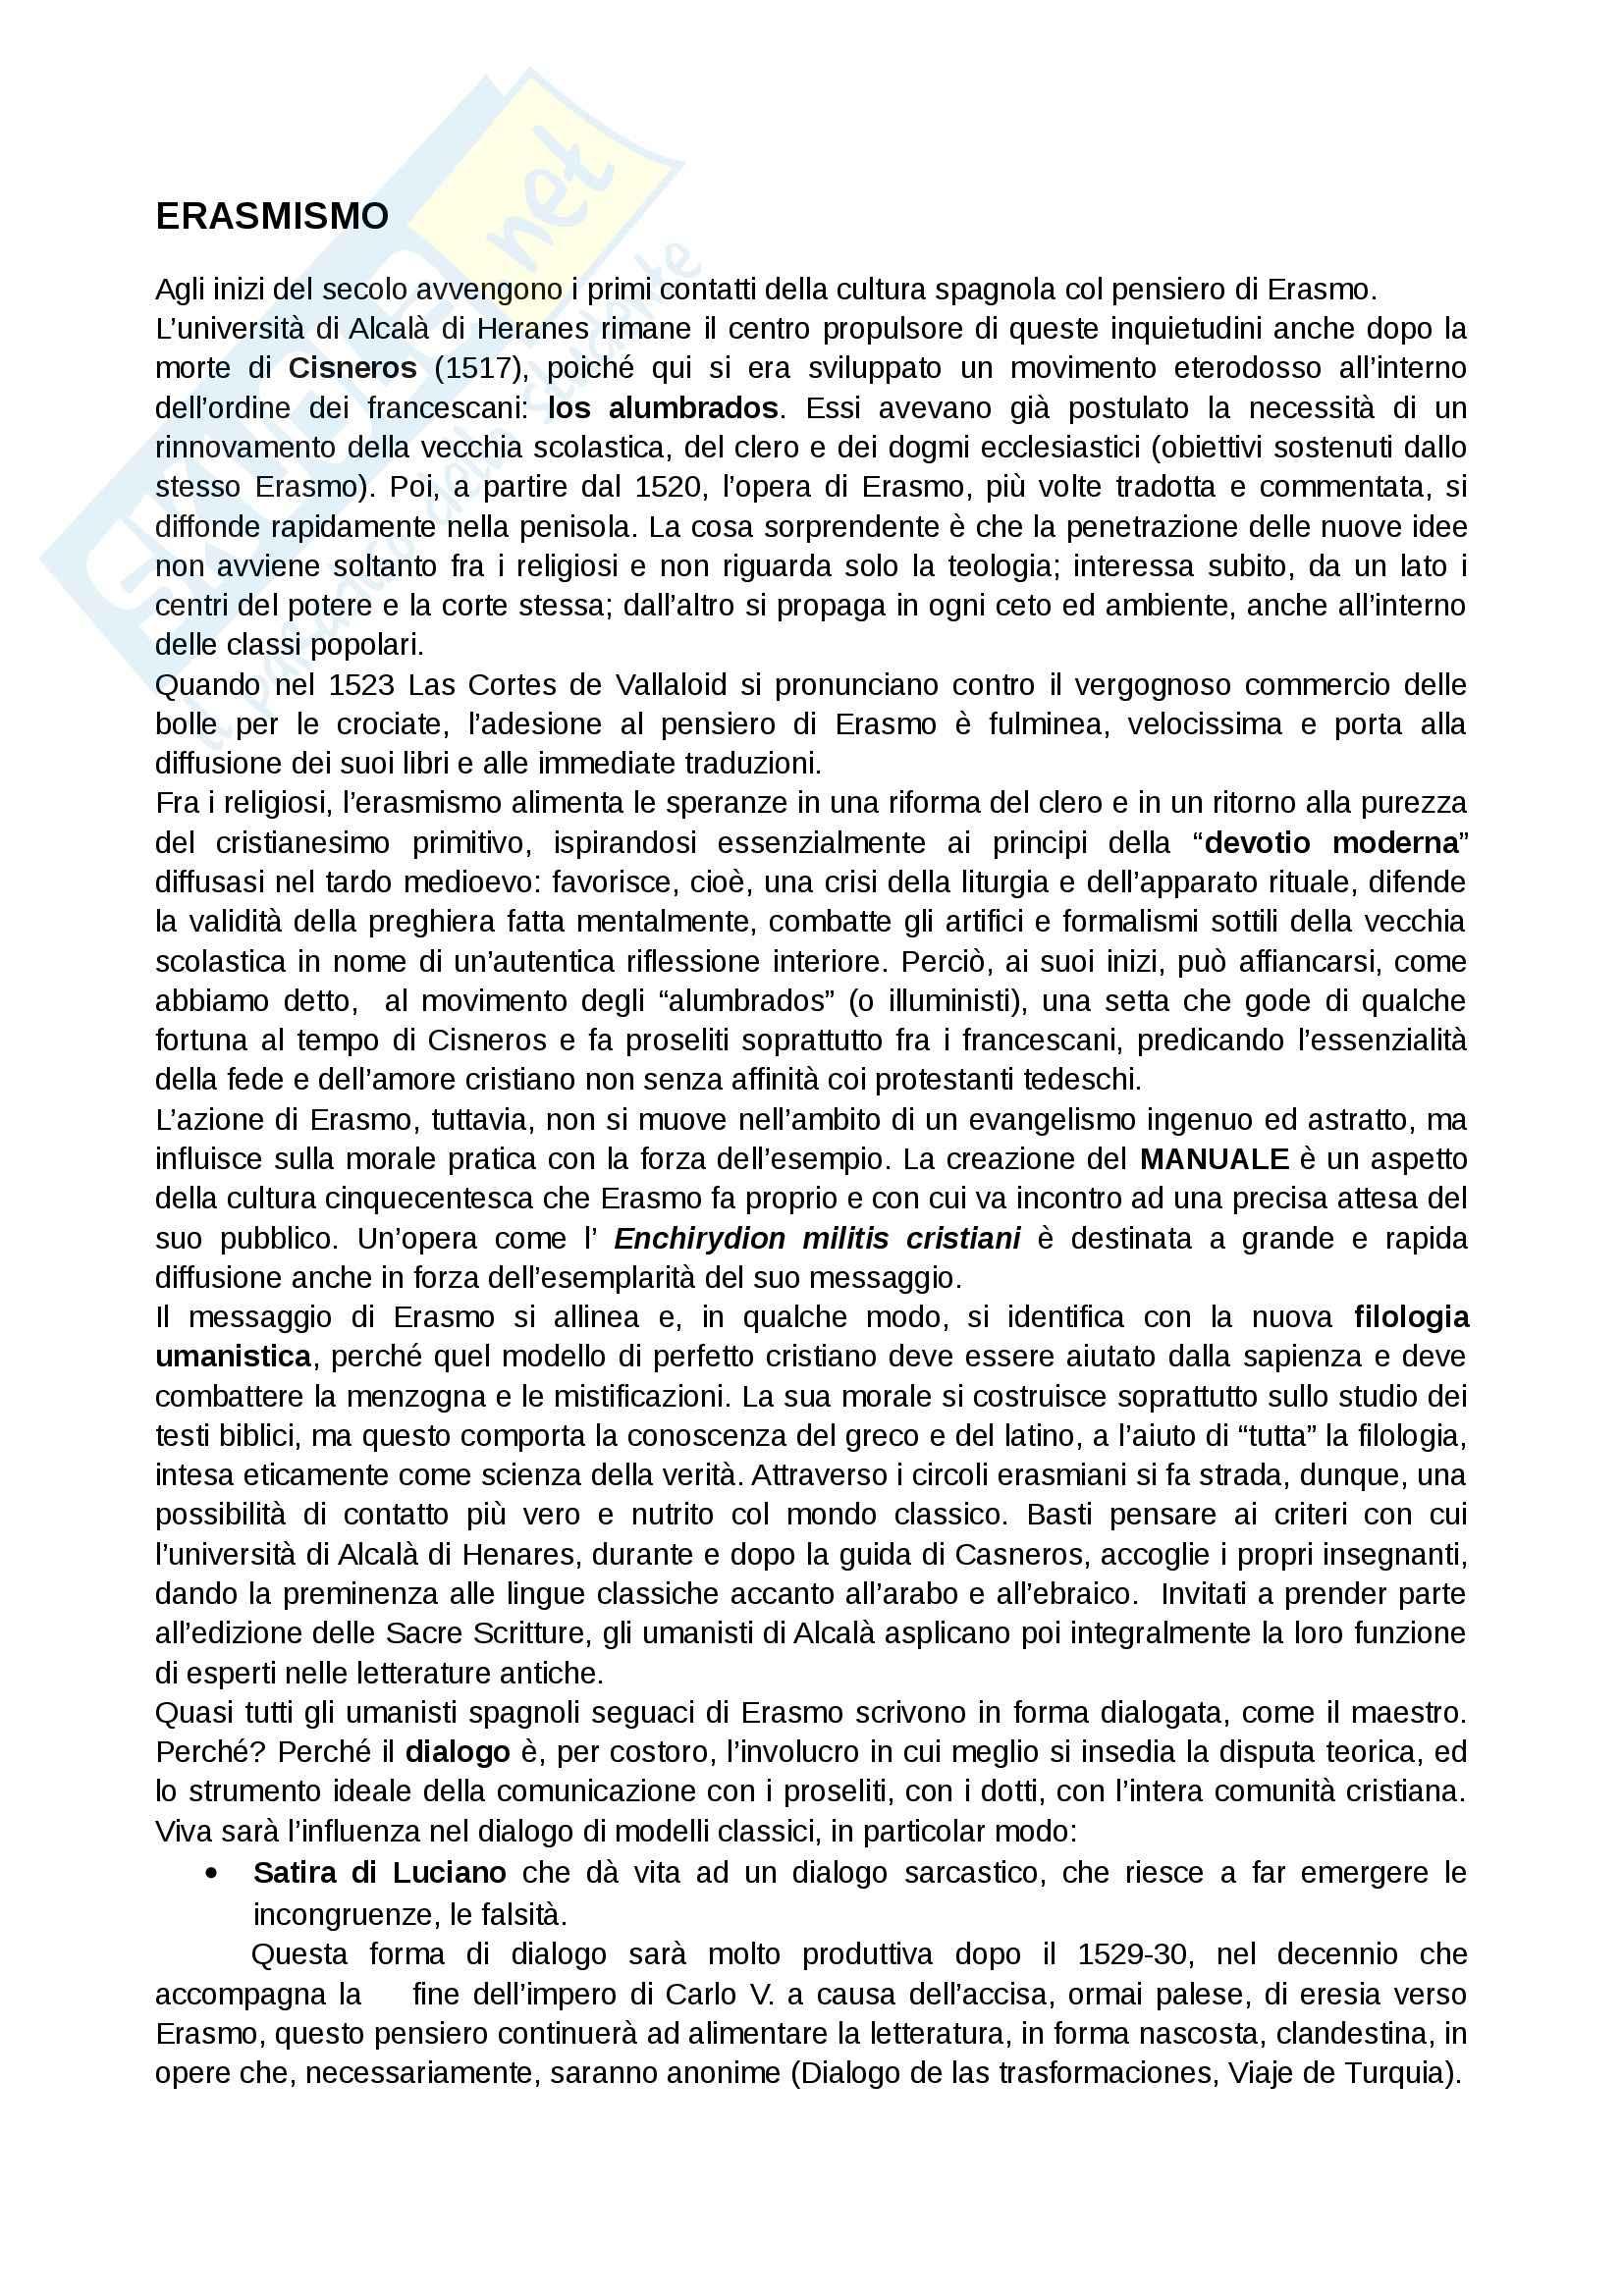 Letteratura spagnola - erasmismo